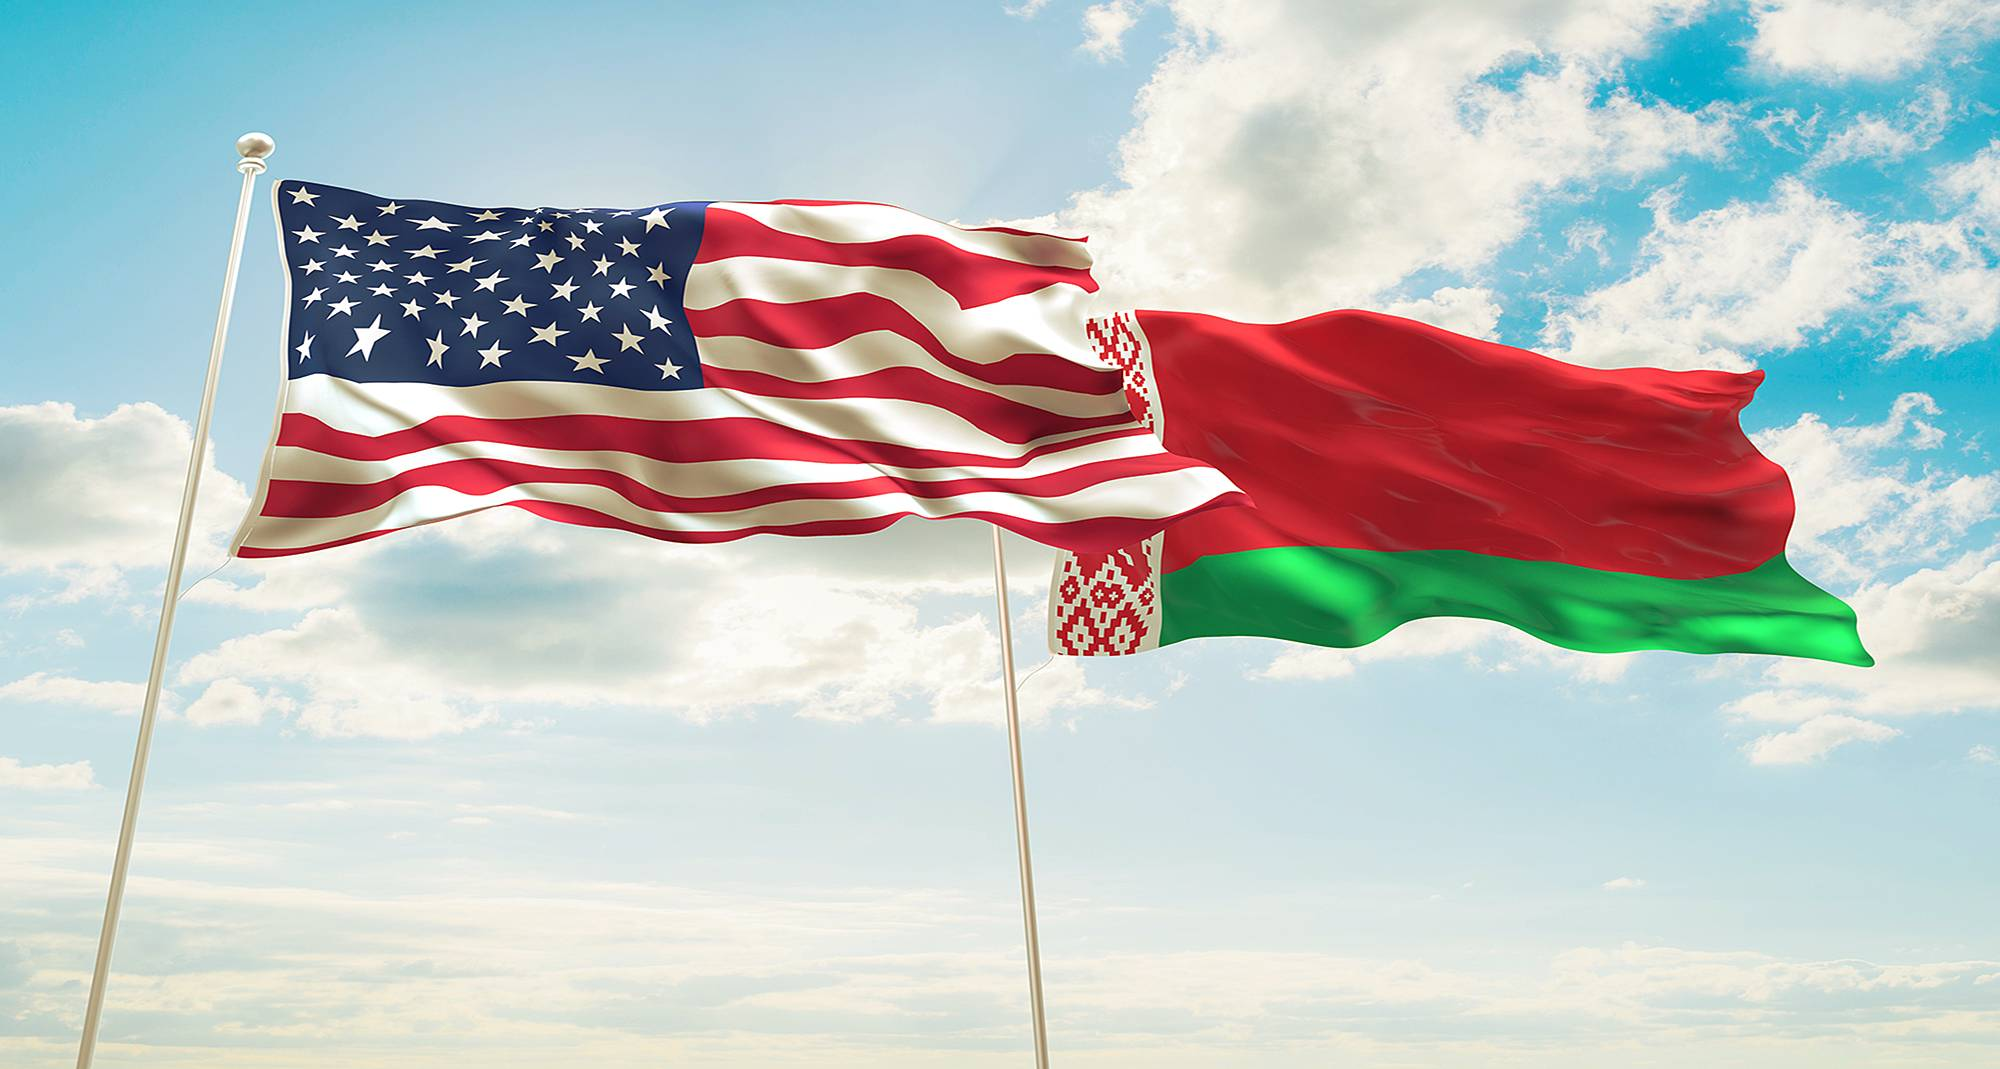 США обещают Беларуси $1,7 миллиона на борьбу с коронавирусом